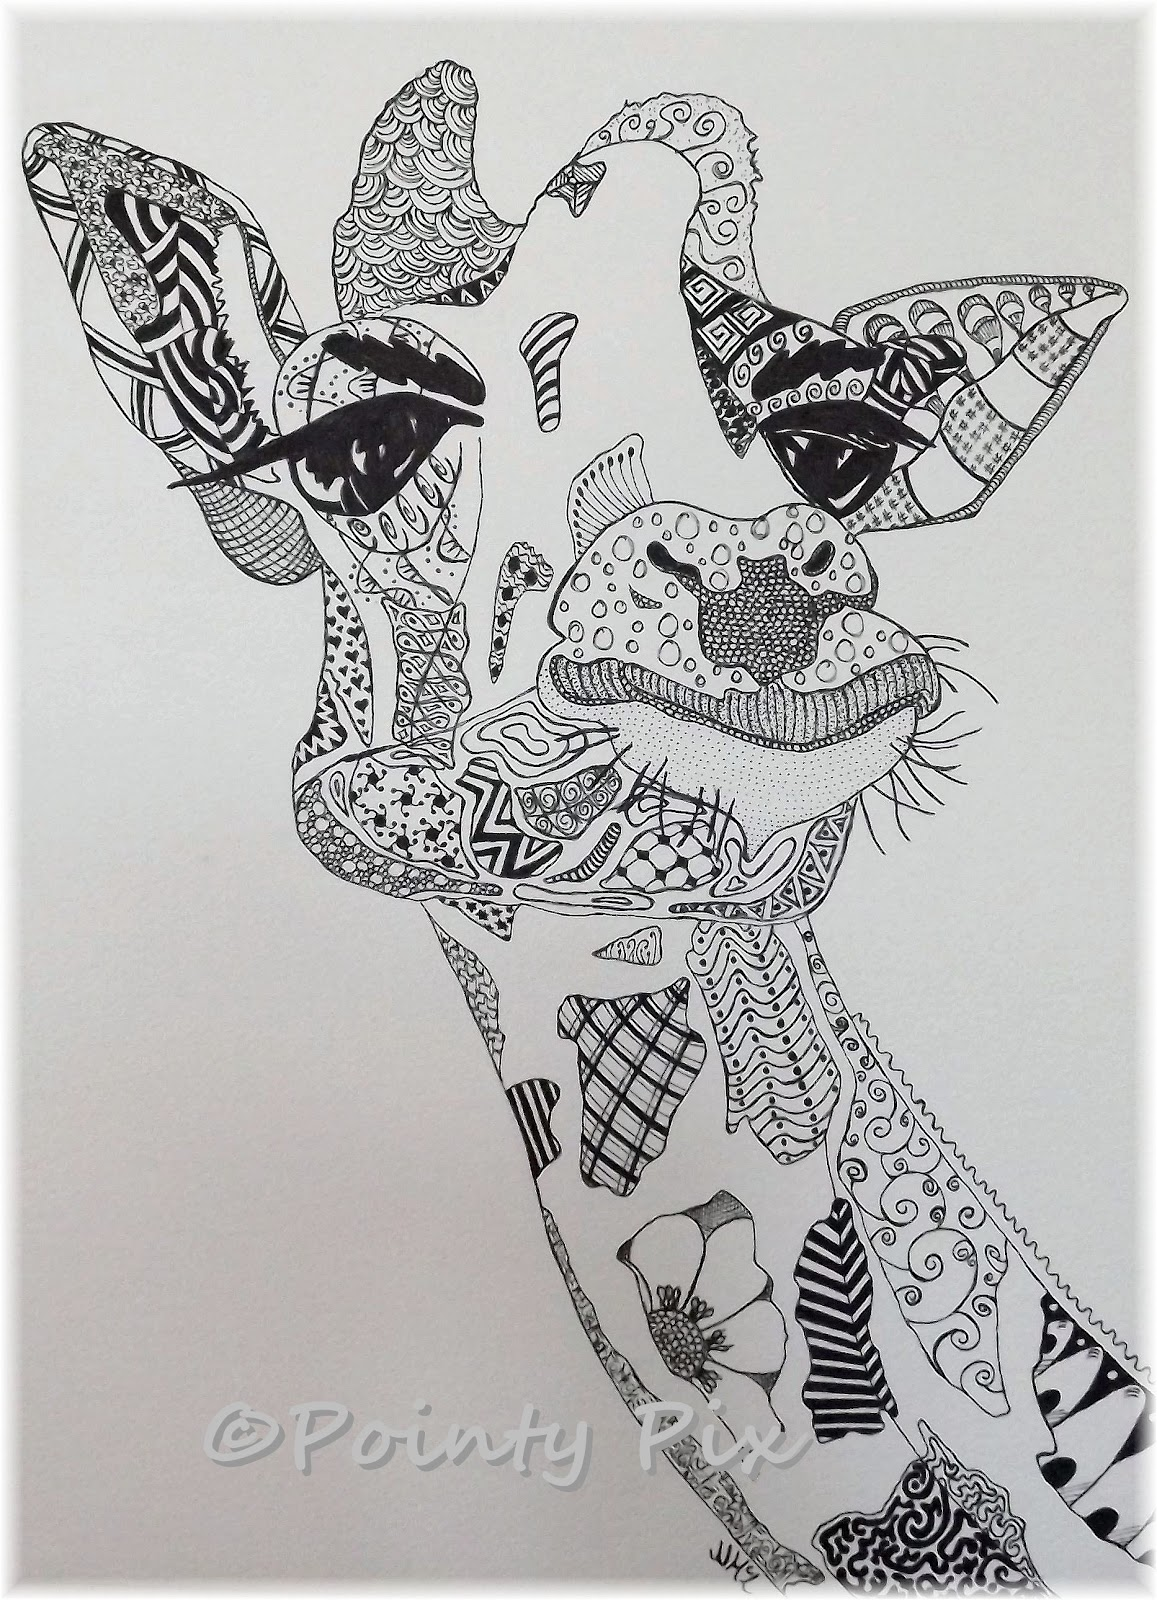 Zentangle ideas on pinterest zentangle giraffes and for Giraffe mandala coloring pages